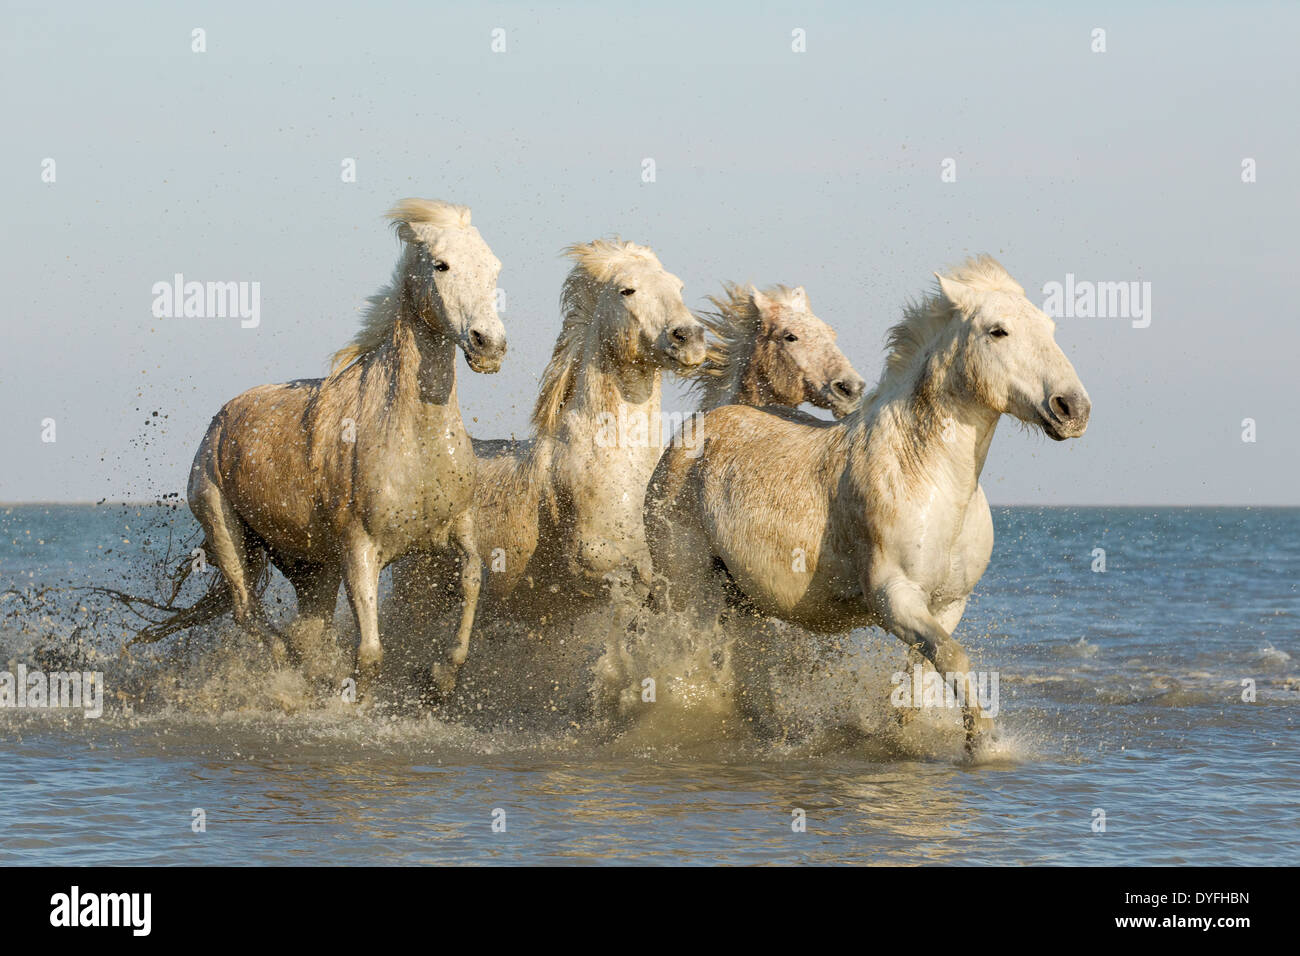 Camargue Horse Running Through Water Stock Photos ... - photo#13